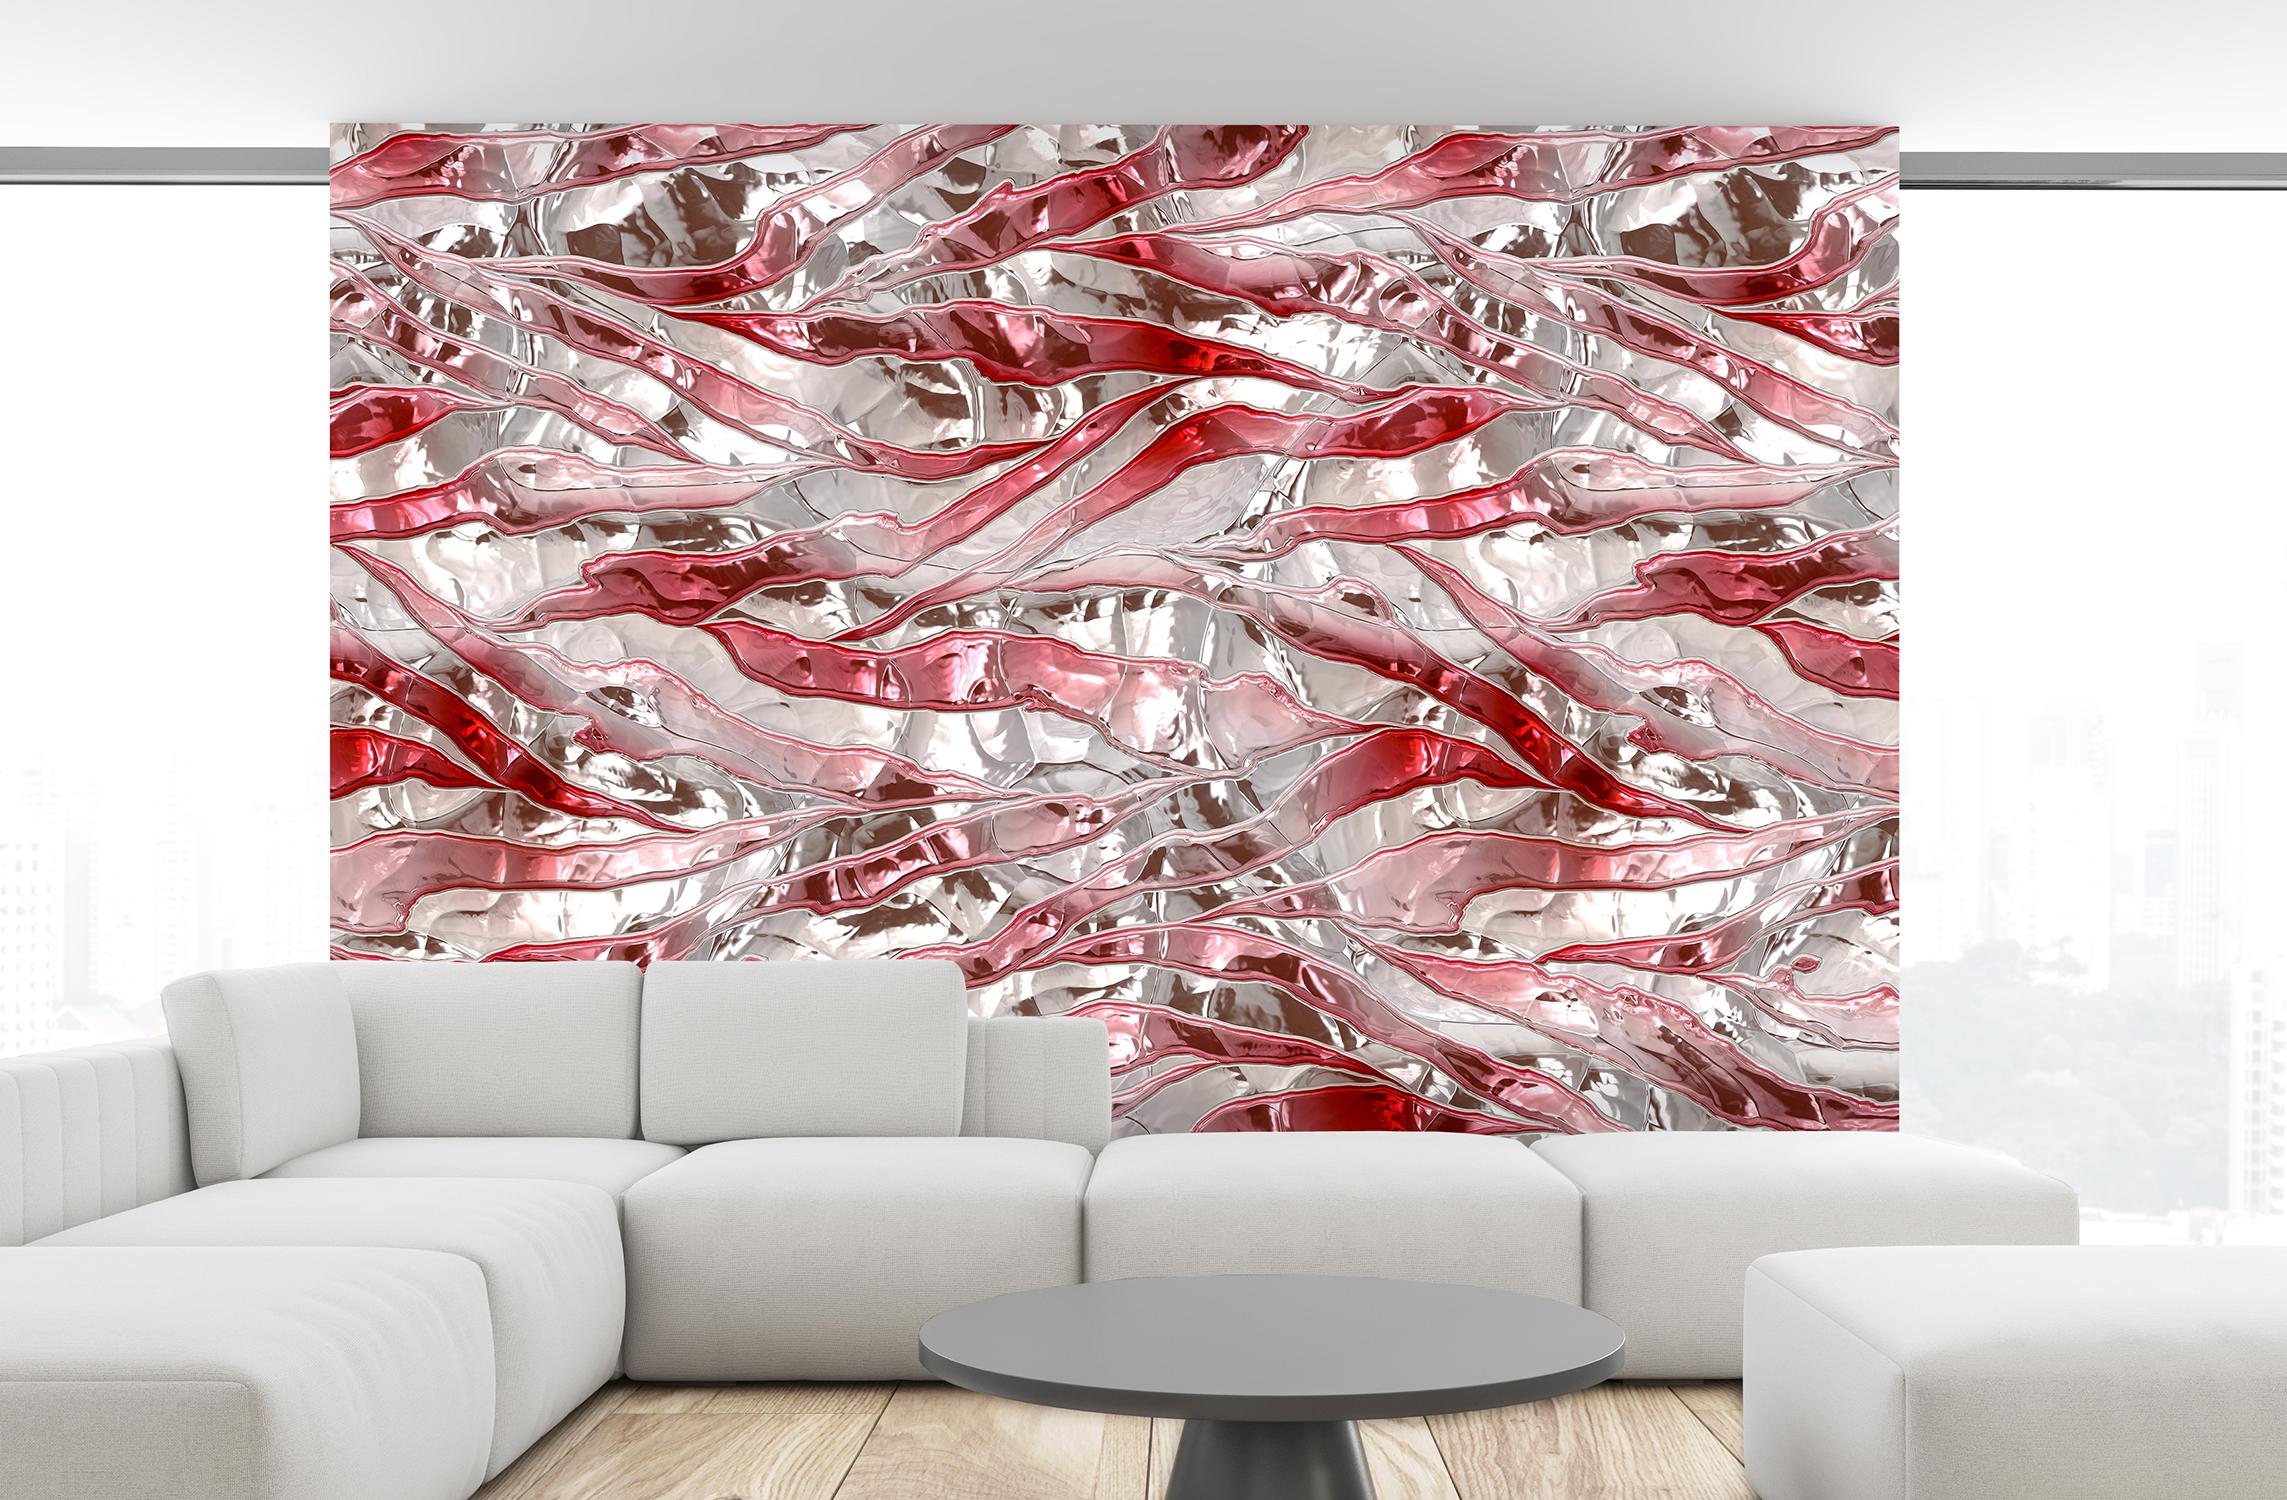 Metalloptik-Knitterstreifen-weiss-rot